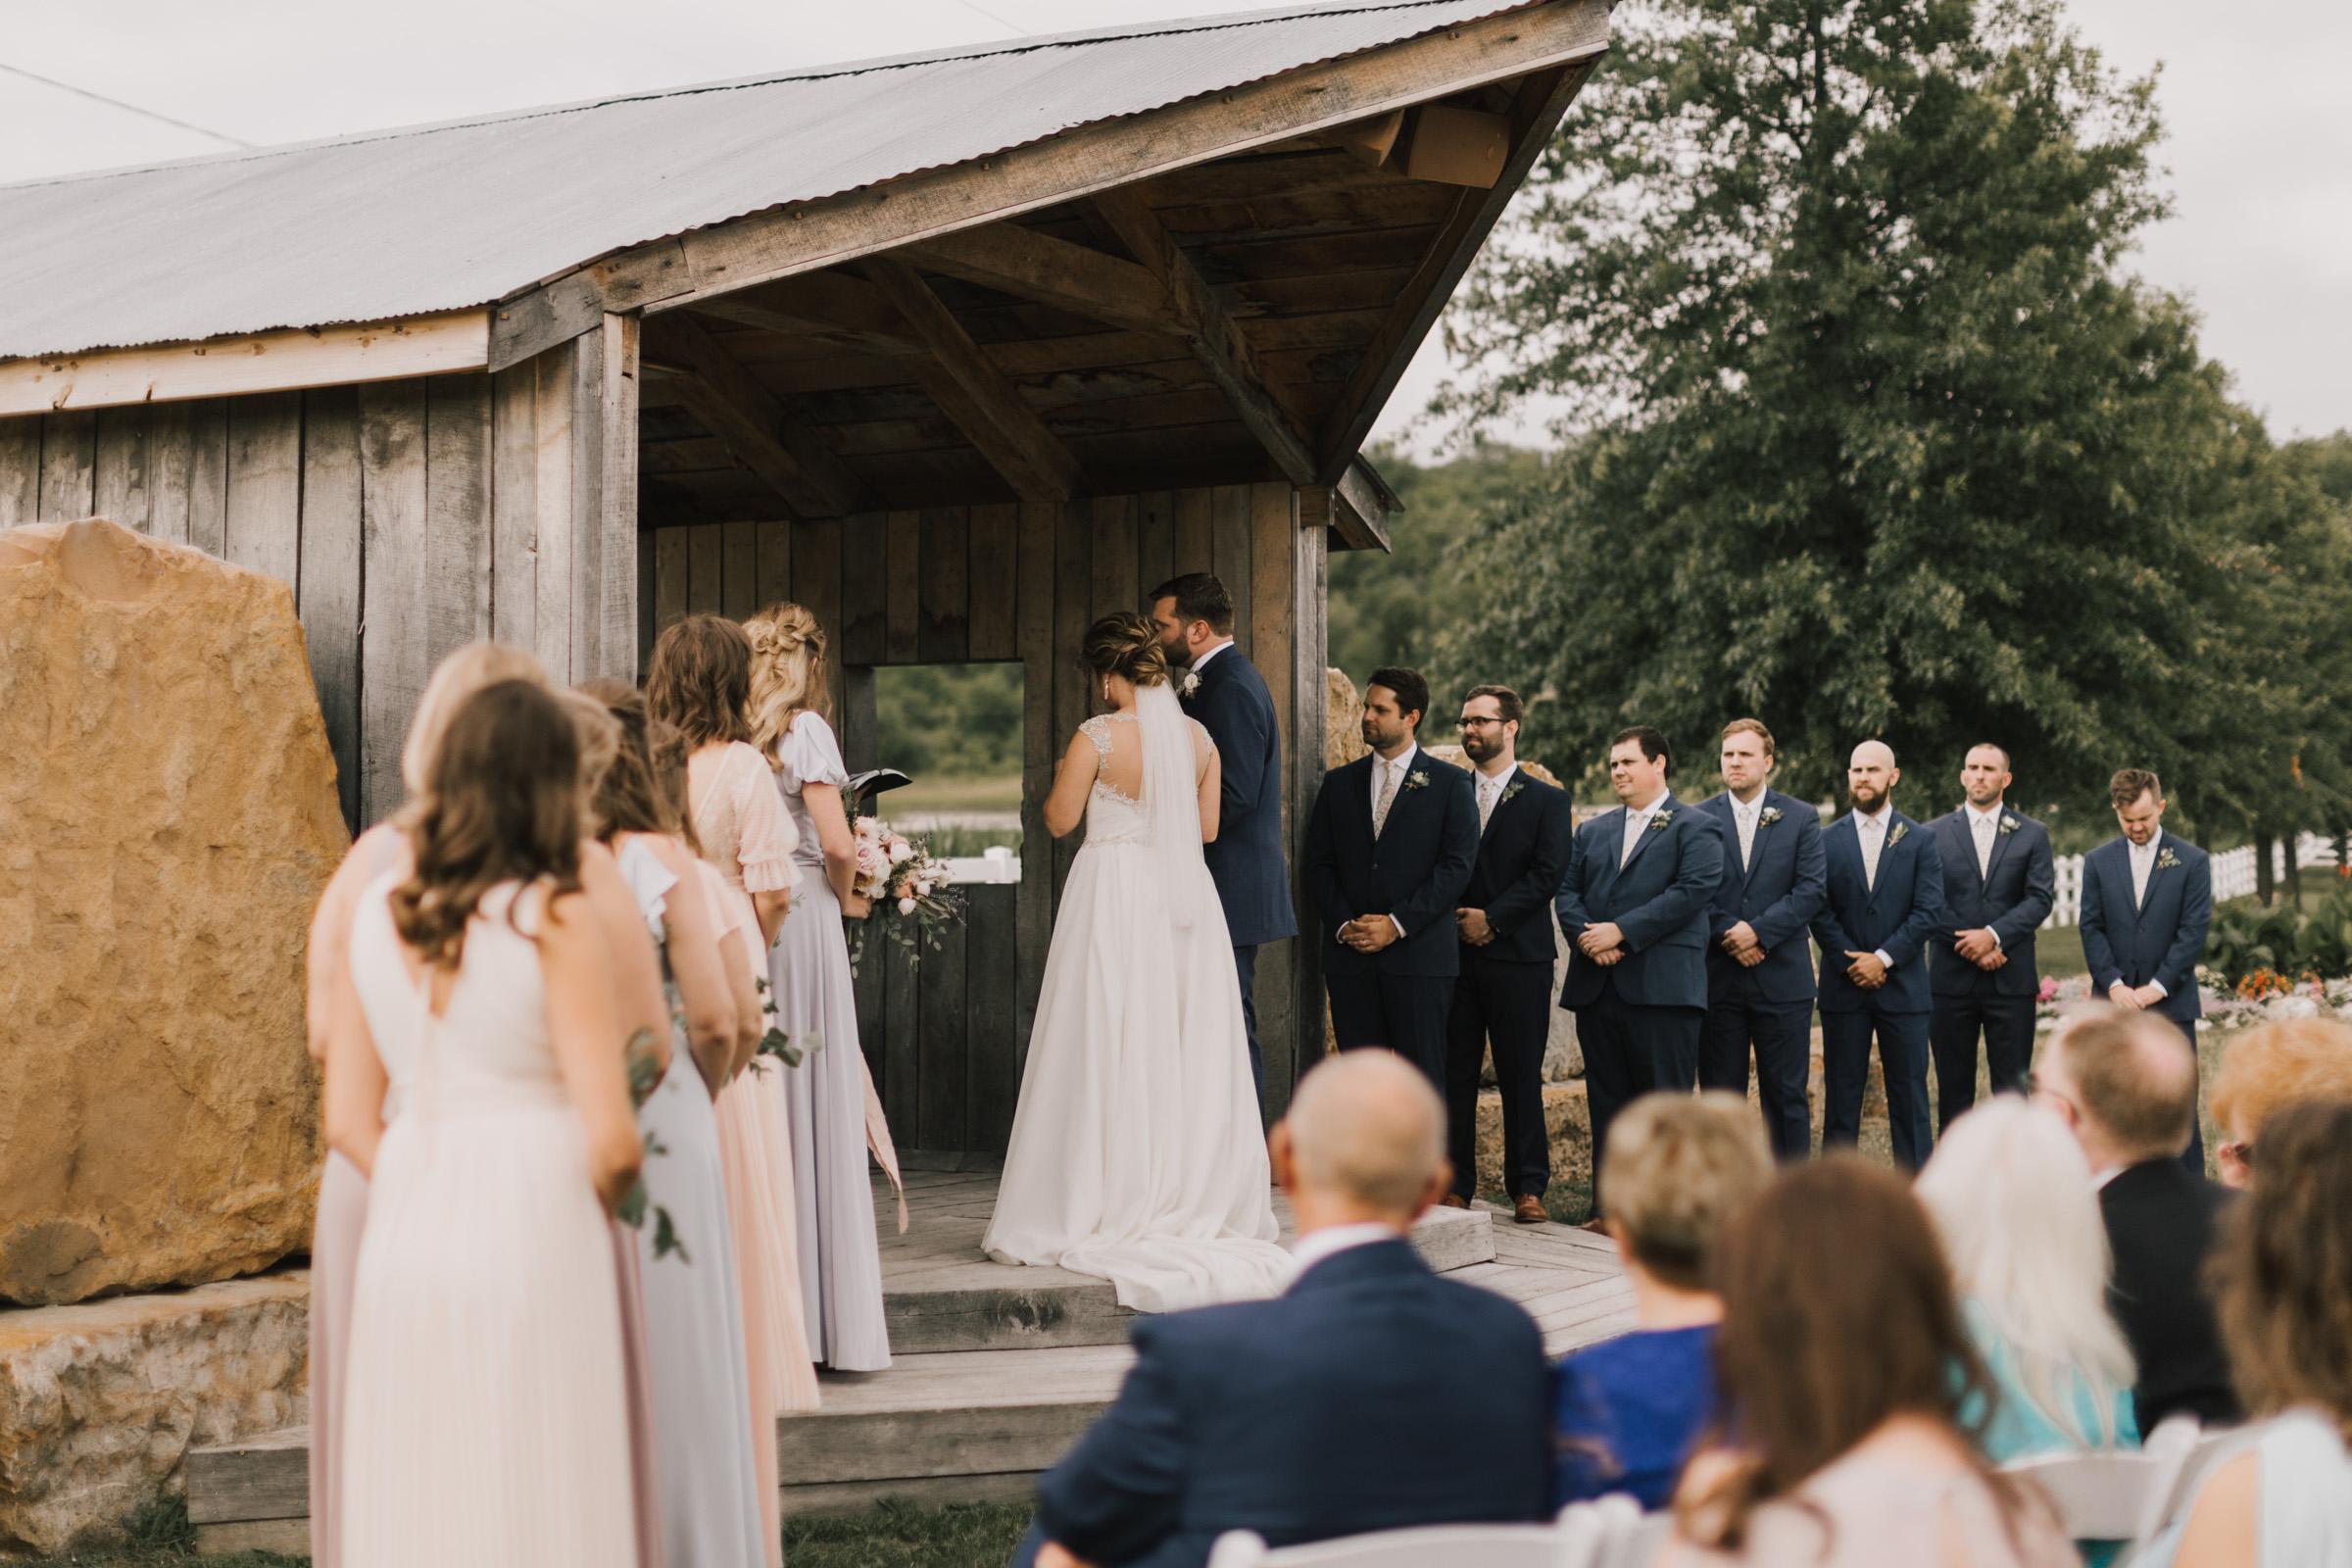 alyssa barletter photography summer odessa missouri wedding kansas city photographer-58.jpg